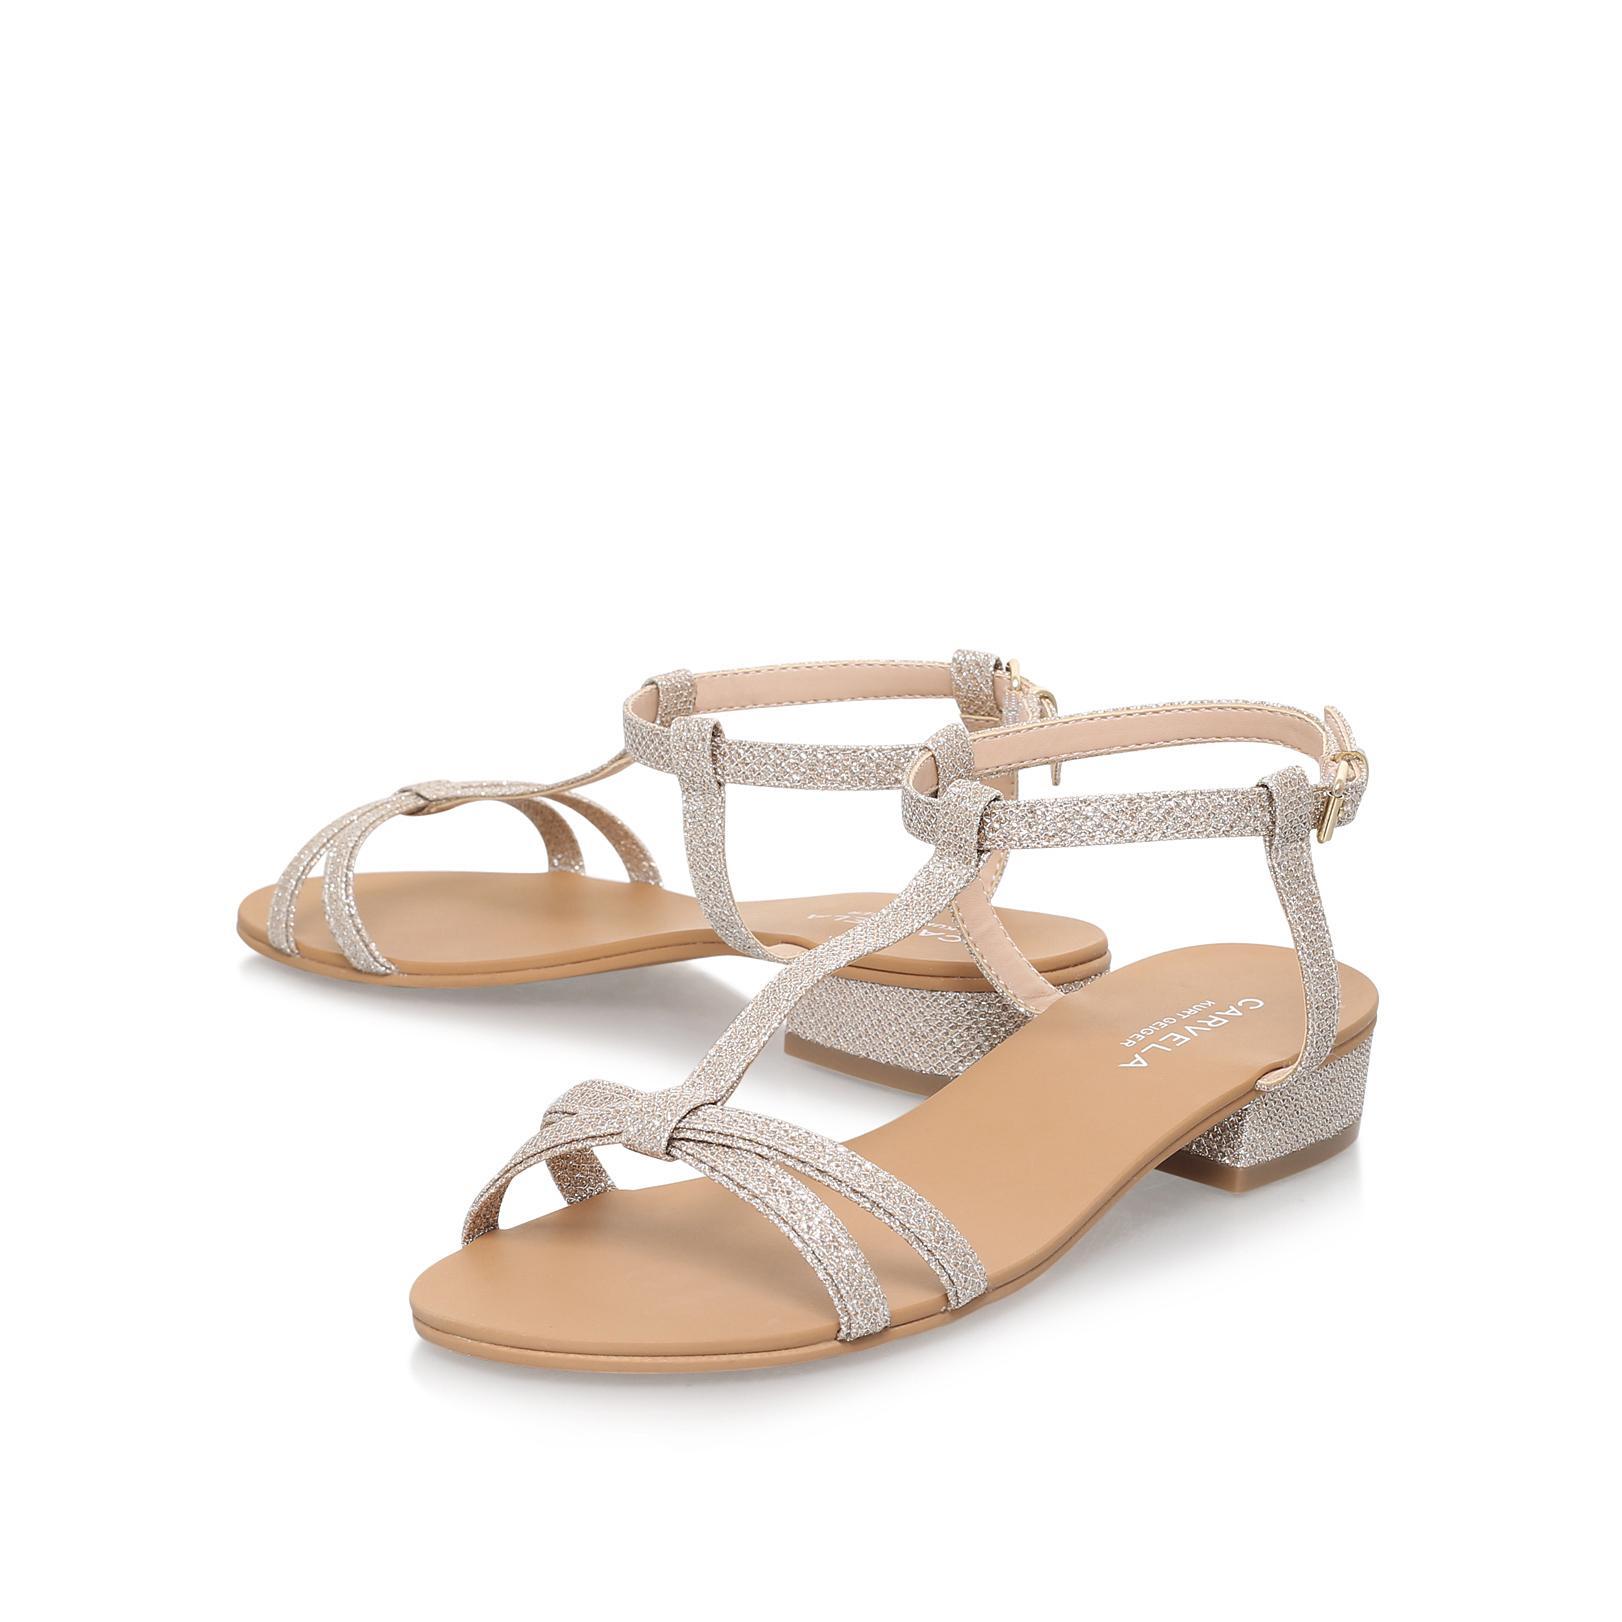 havana multi coloured high heel sandals from KG Kurt